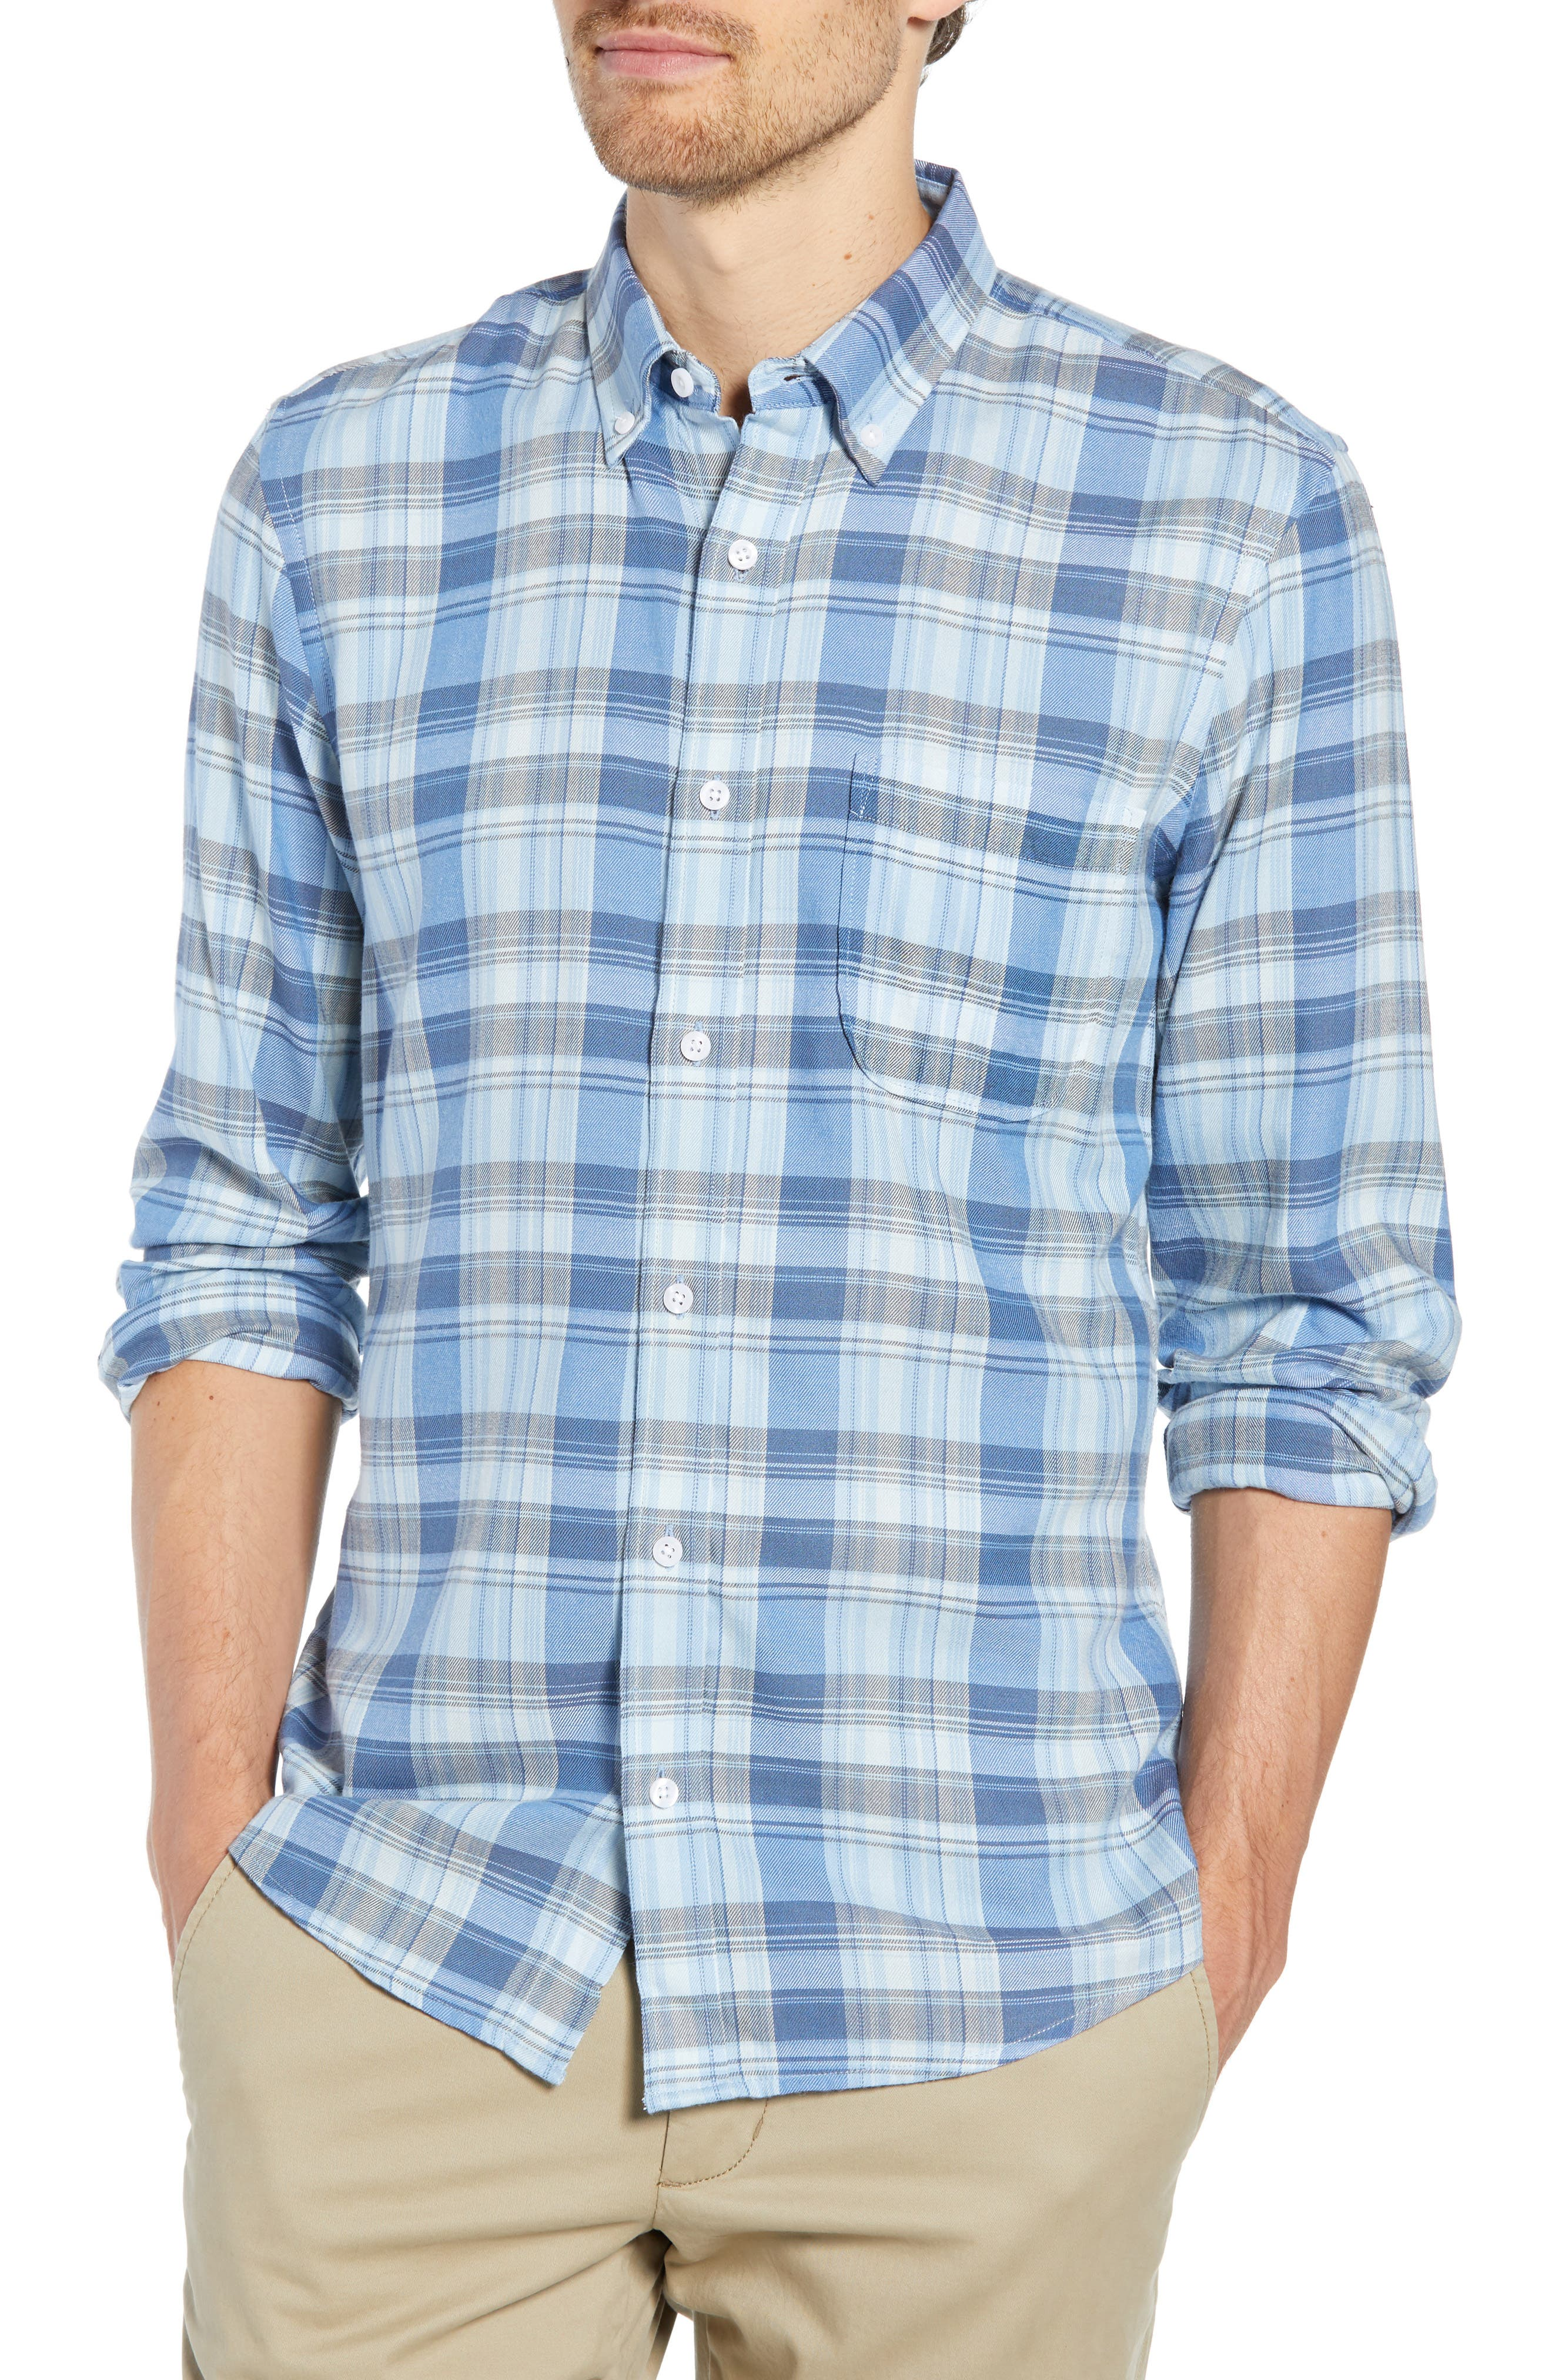 Slim Fit Plaid Sport Shirt,                             Main thumbnail 1, color,                             BLUE CHAMBRAY BLUE DARK PLAID